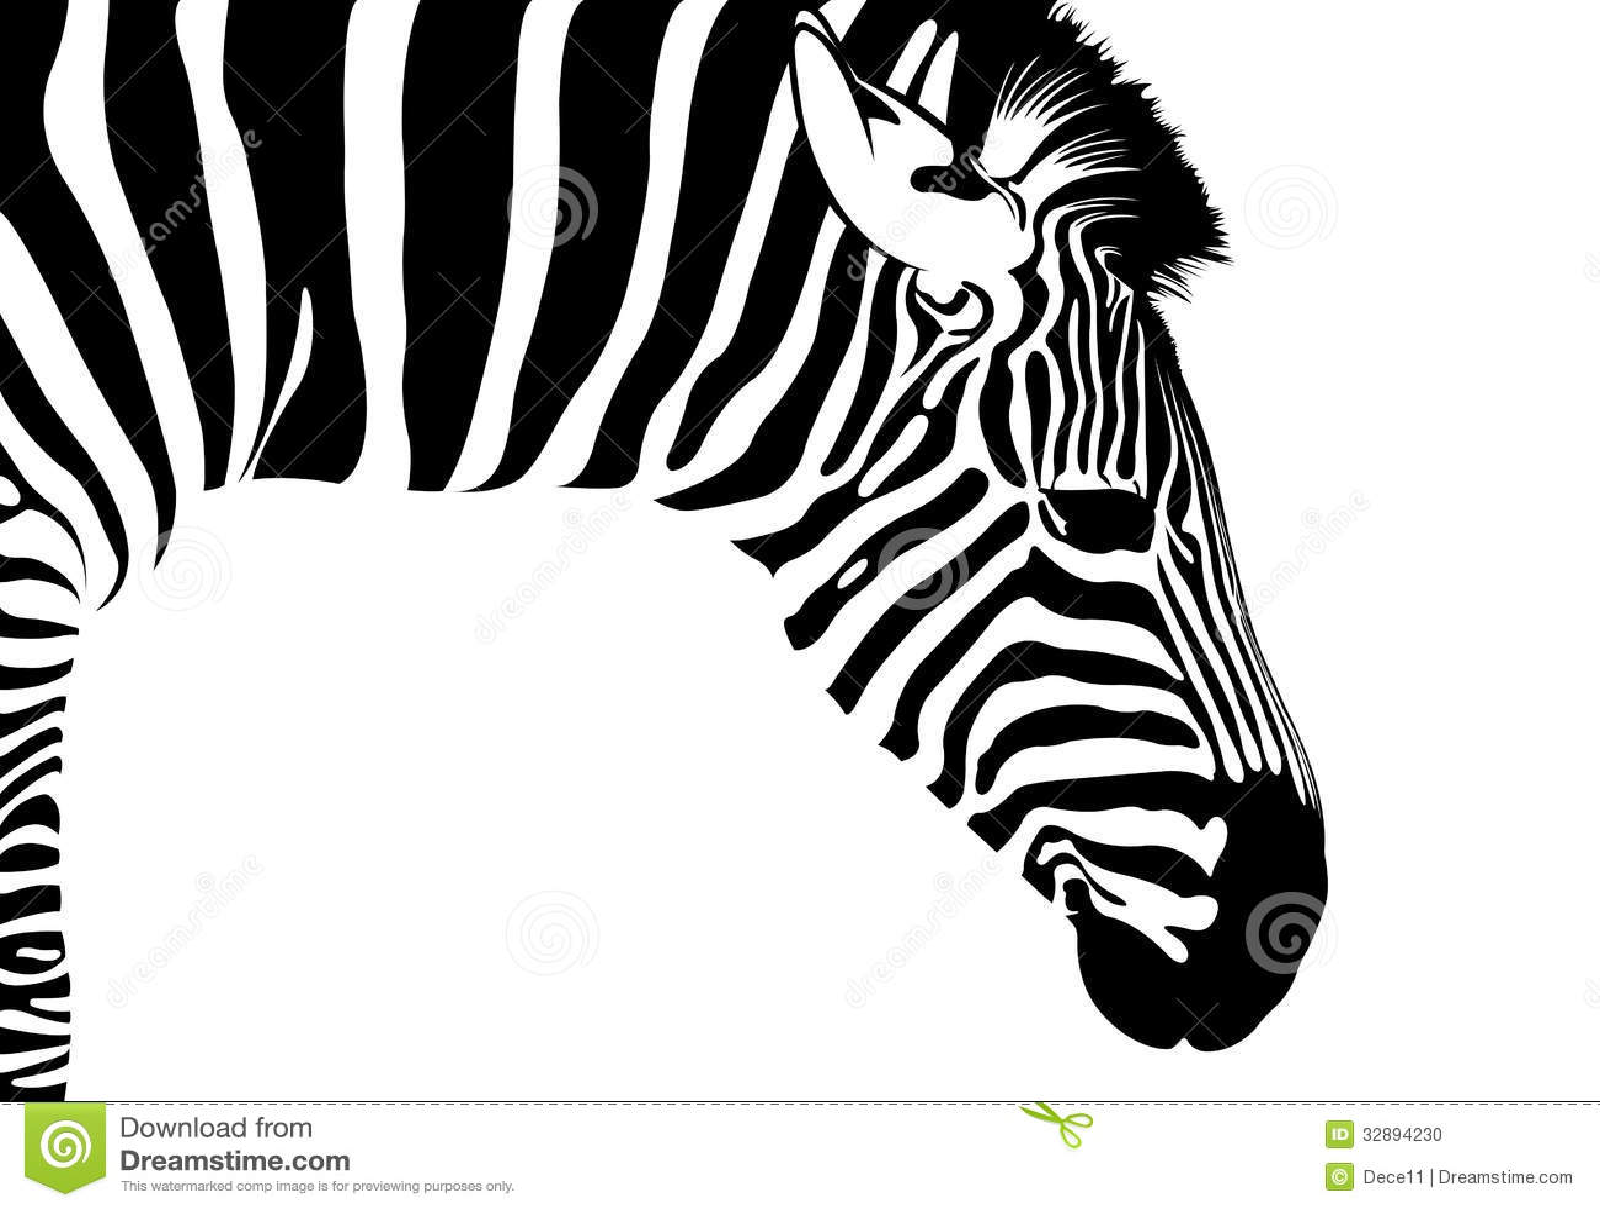 Isolated Zebra Silhouette Vector Black Stripes Vector